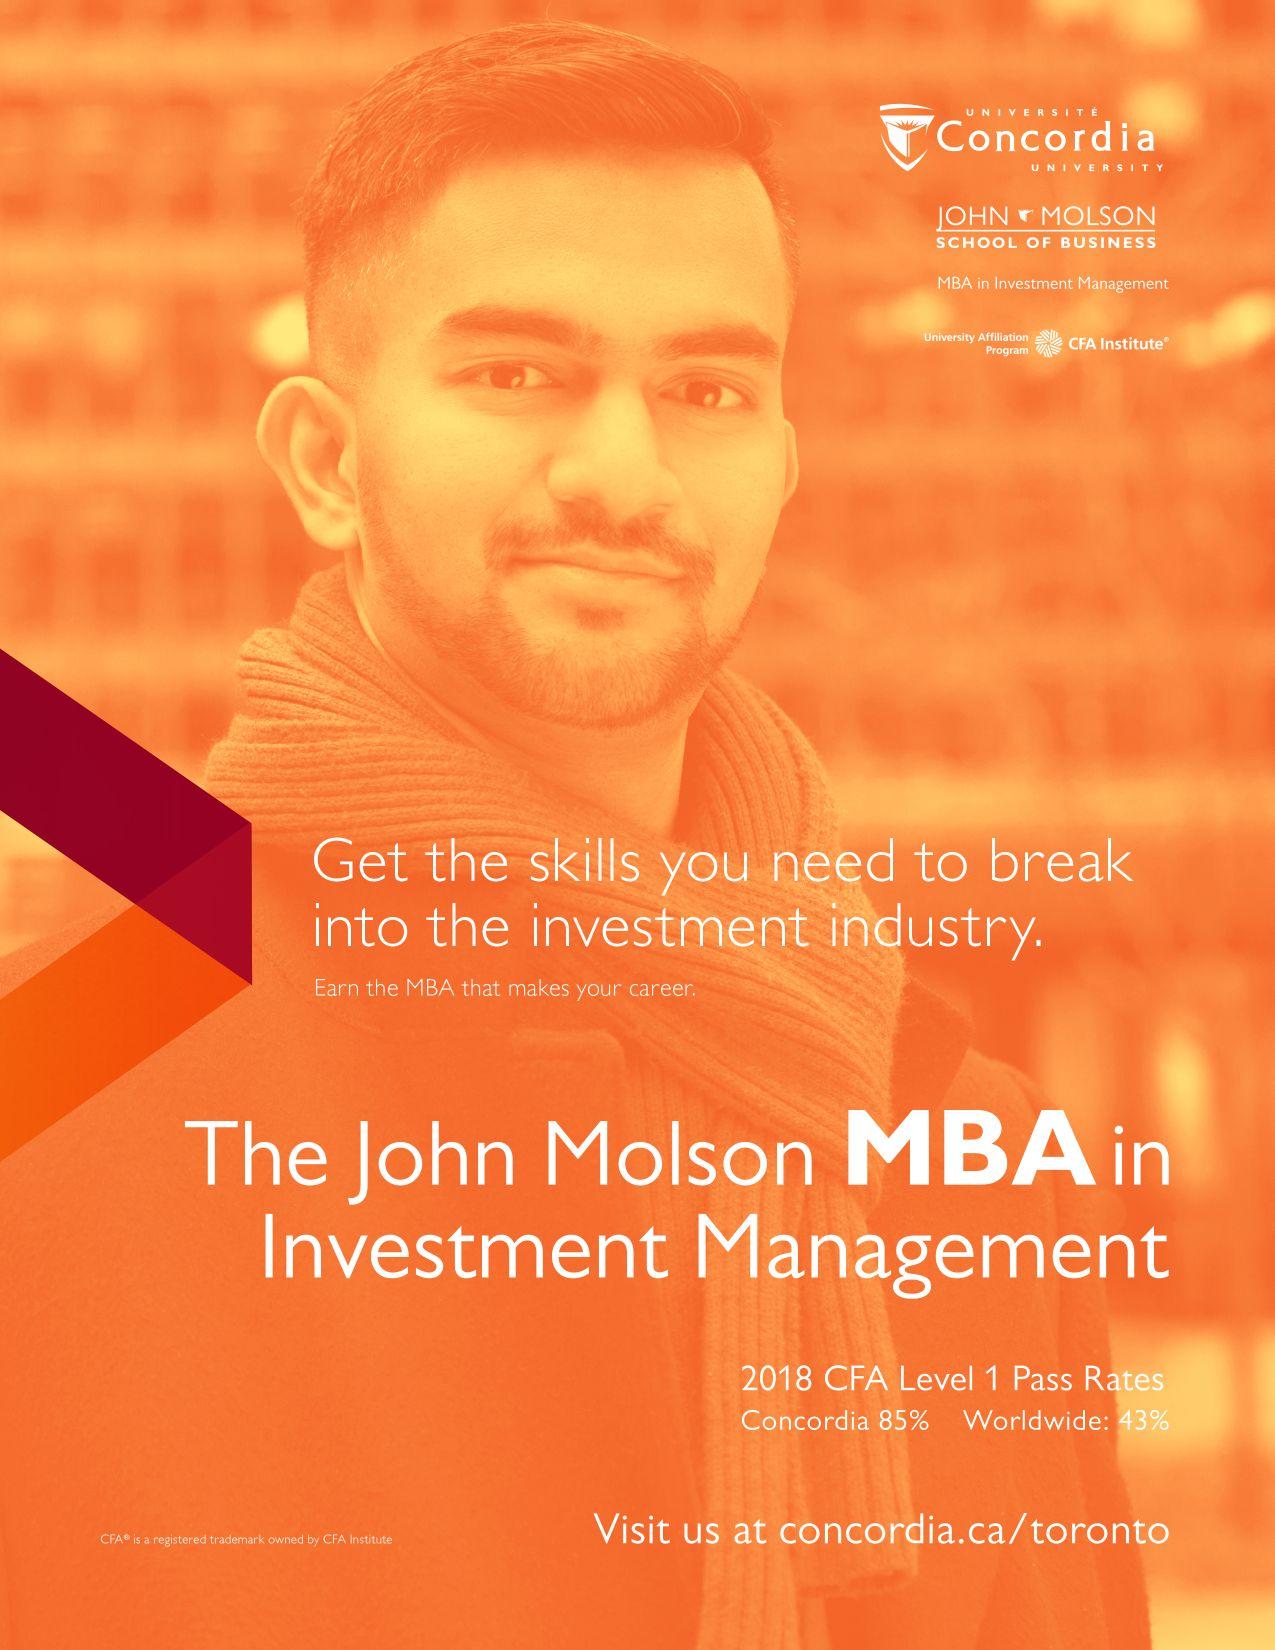 Concordia University John Molson School Rostie Group Scoop Advertisement